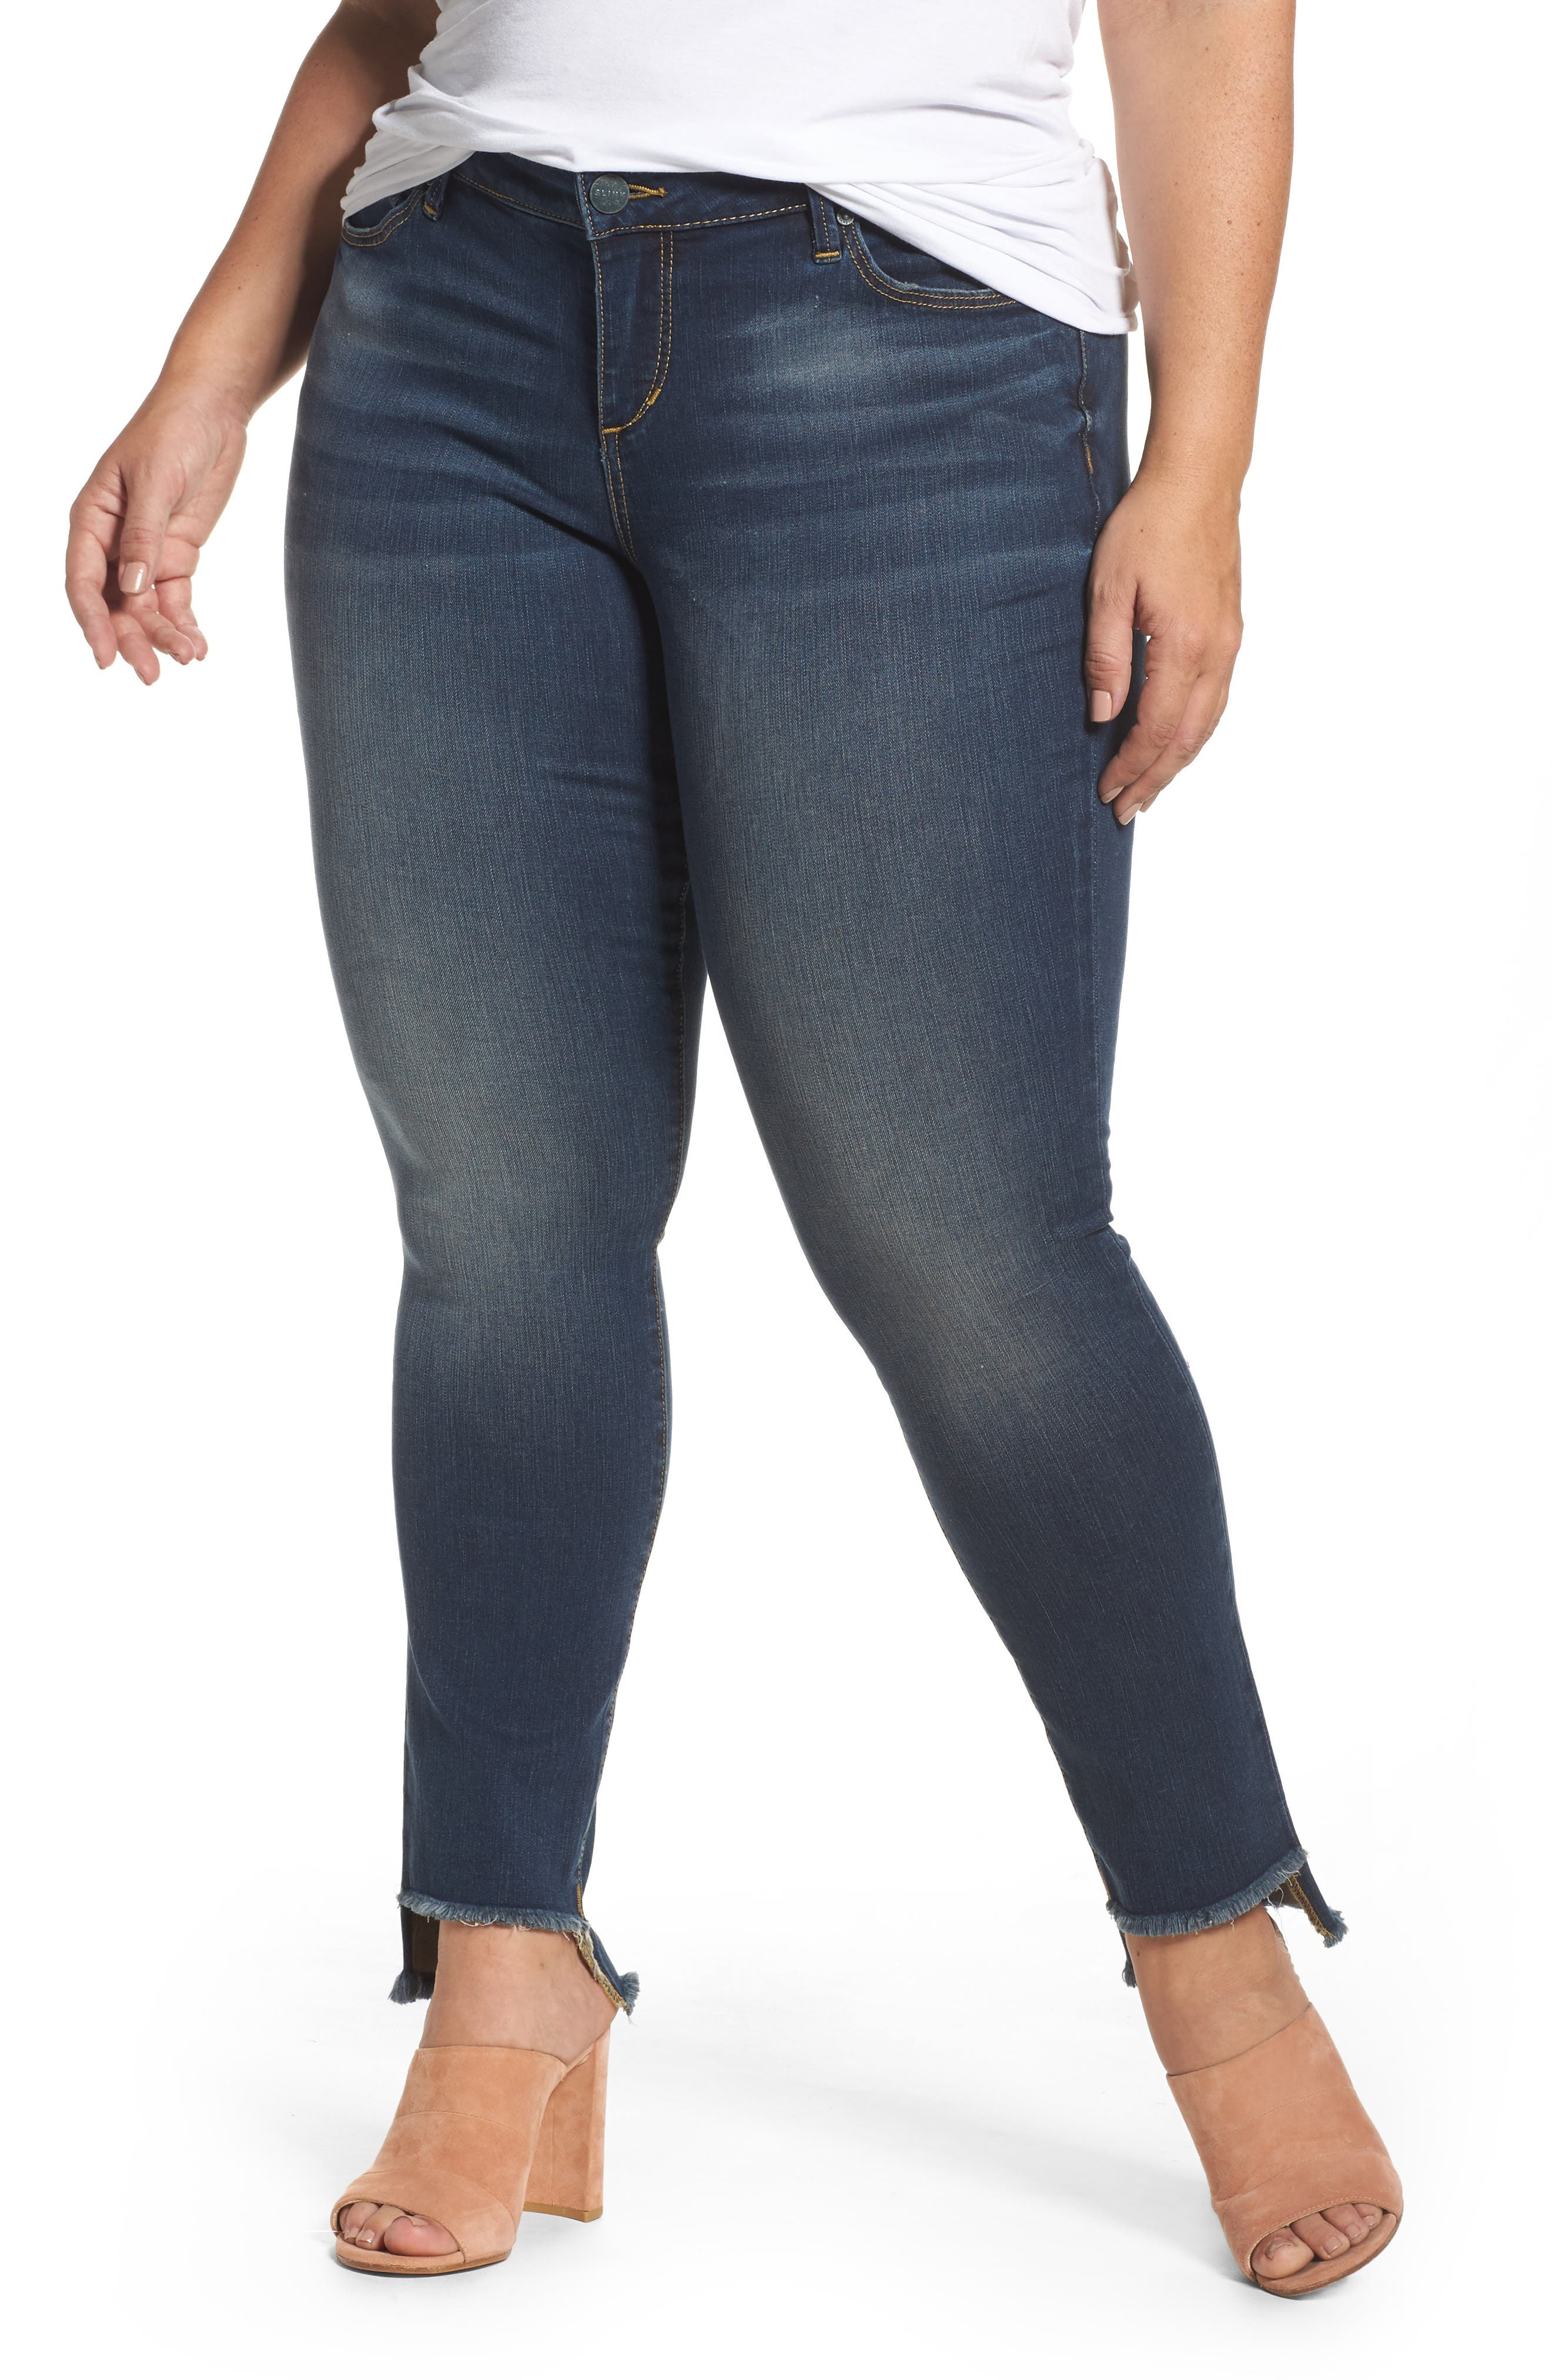 Alternate Image 1 Selected - SLINK Jeans Step Hem Skinny Jeans (Danielle) (Plus Size)